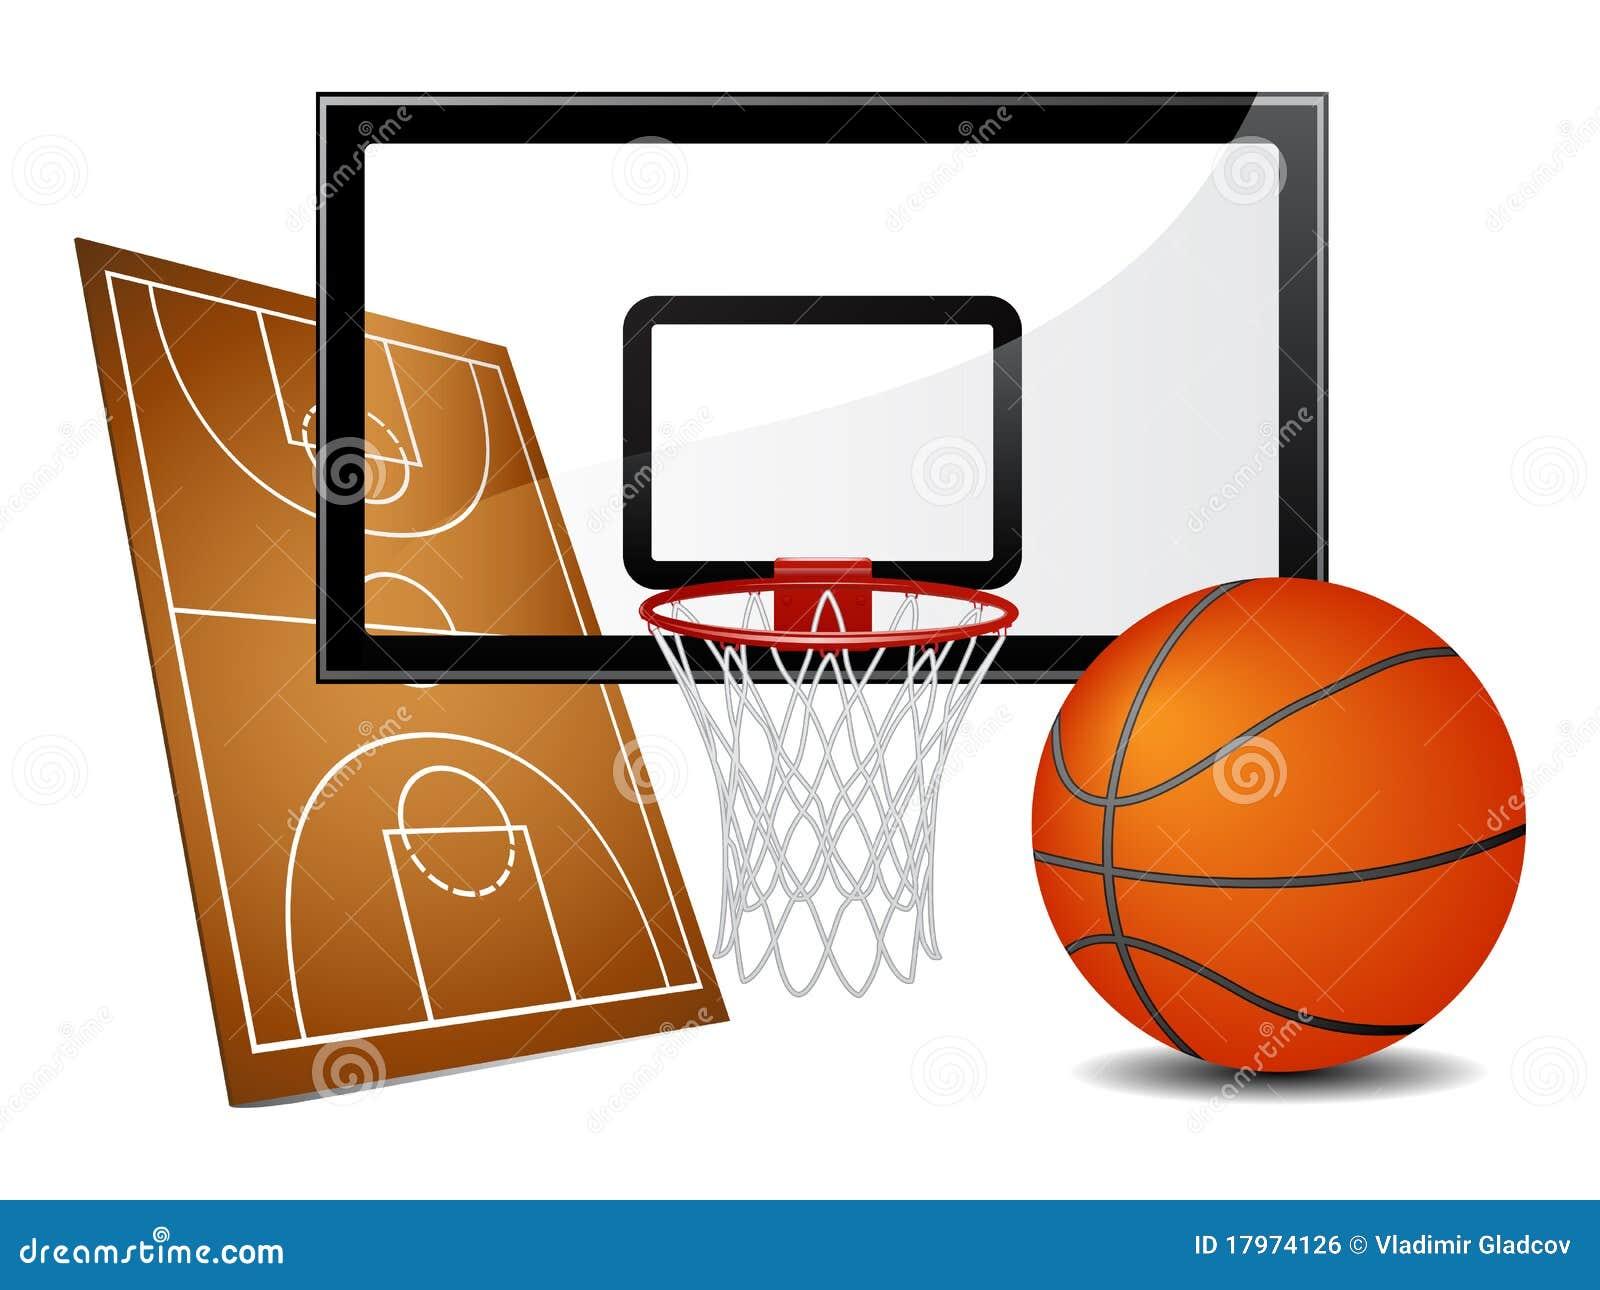 Basketball design elements royalty free stock image - Canasta de baloncesto ...